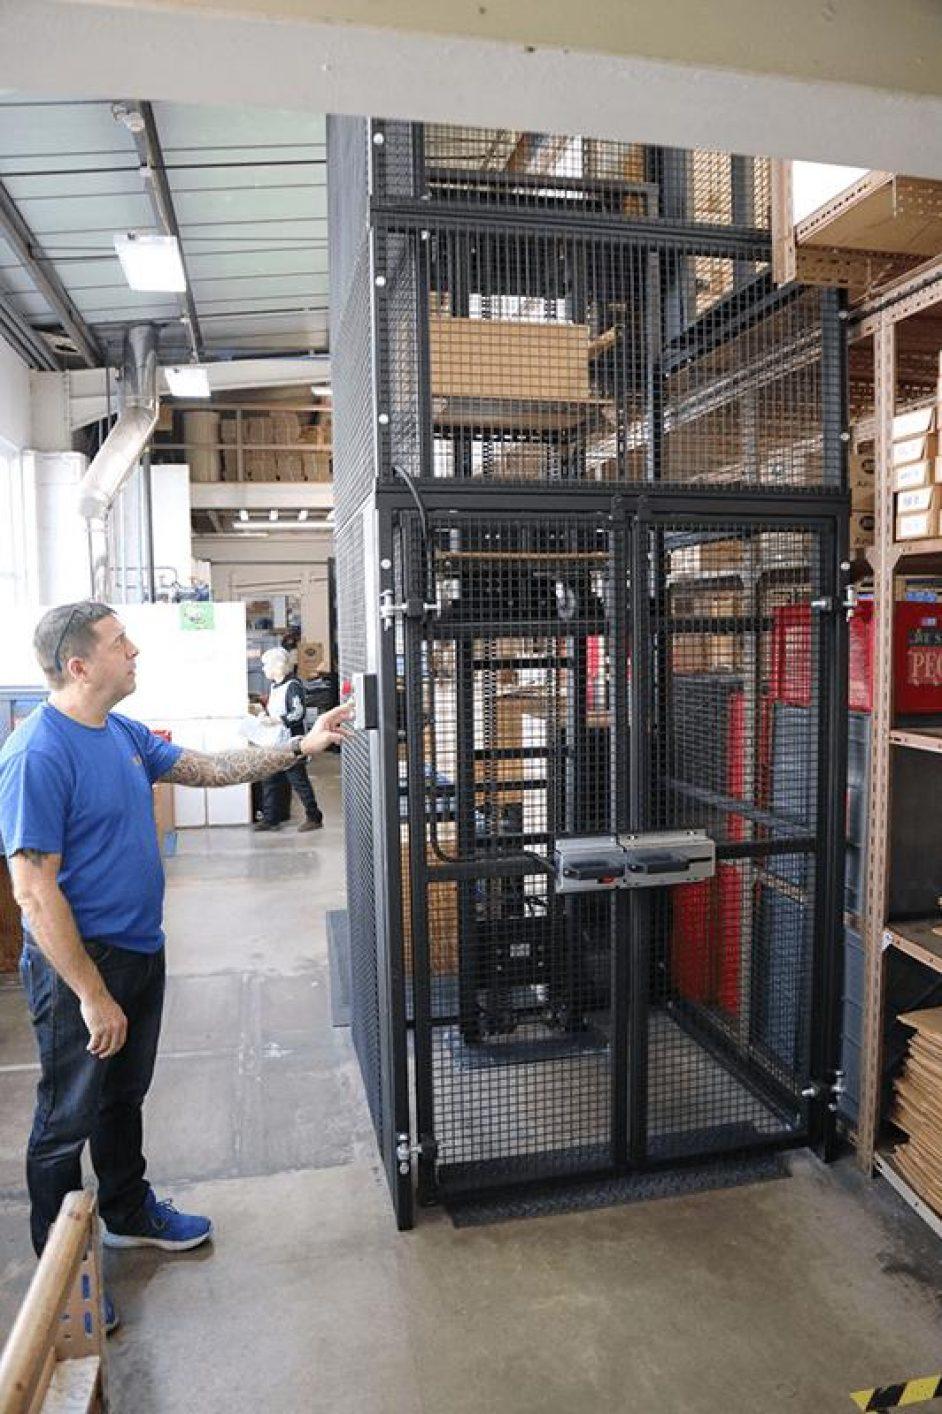 Lifting equipment used under LOLER